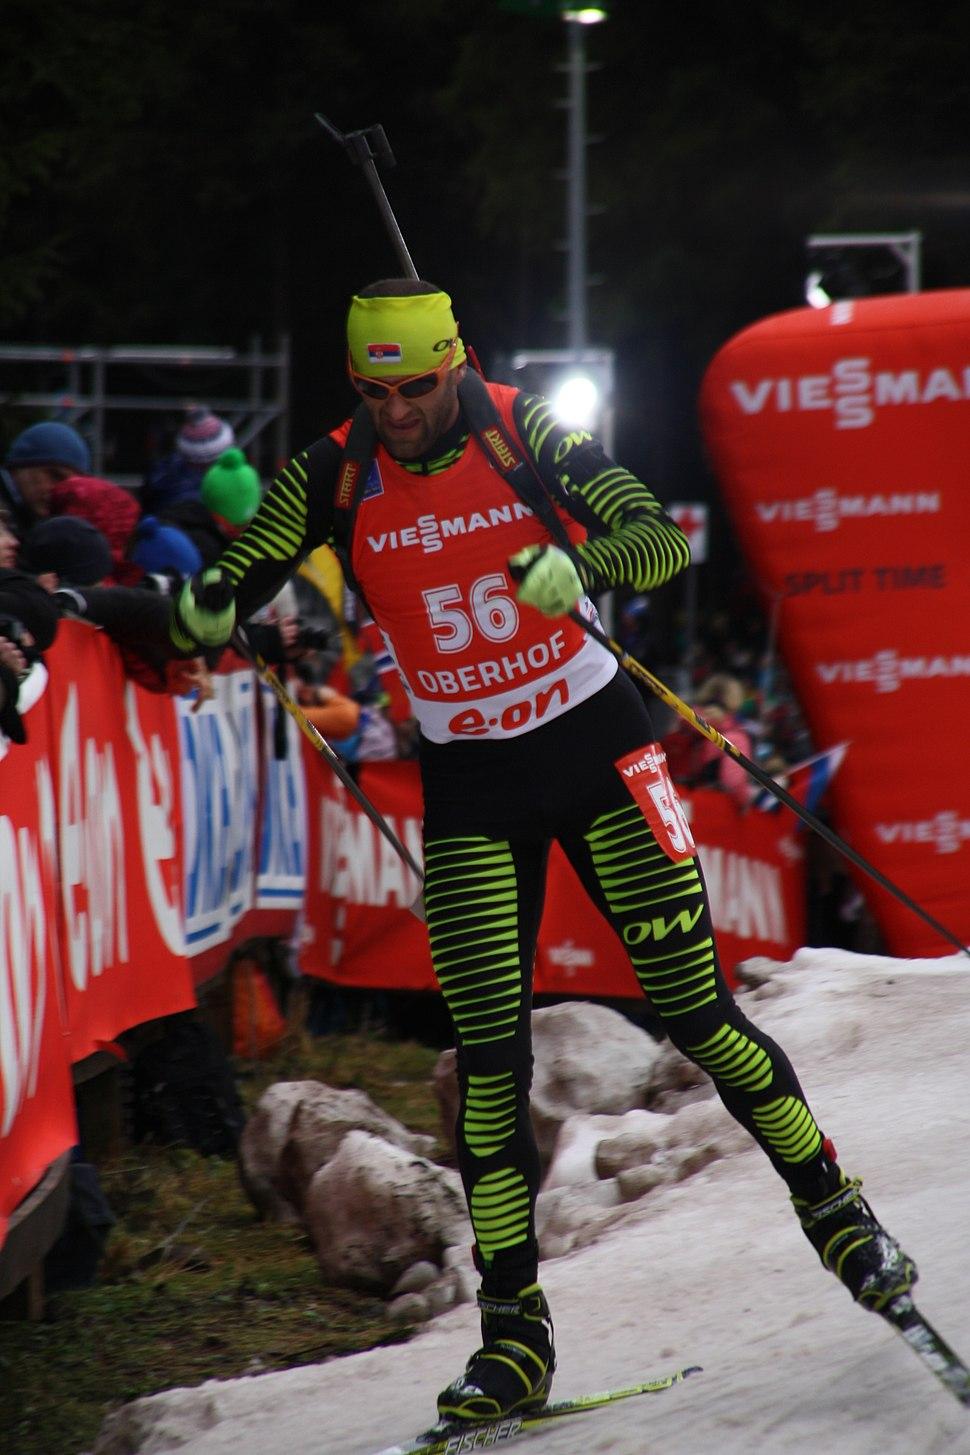 2014-01-04 Biathlon World Cup Oberhof - Mens Pursuit - 56 - Milanko Petrović